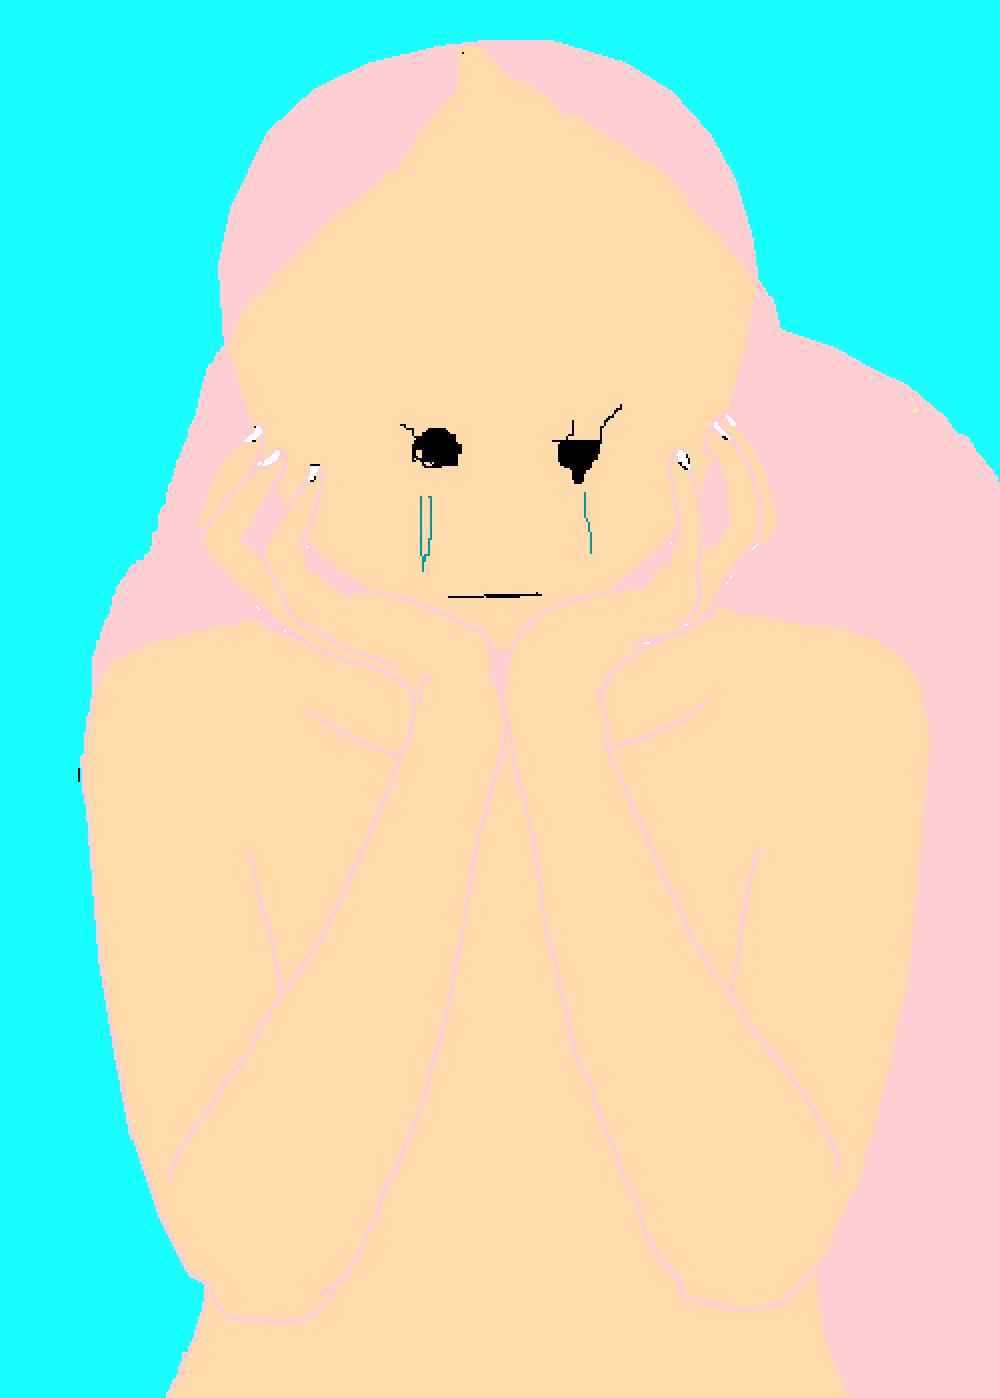 a sad day by girlpower123